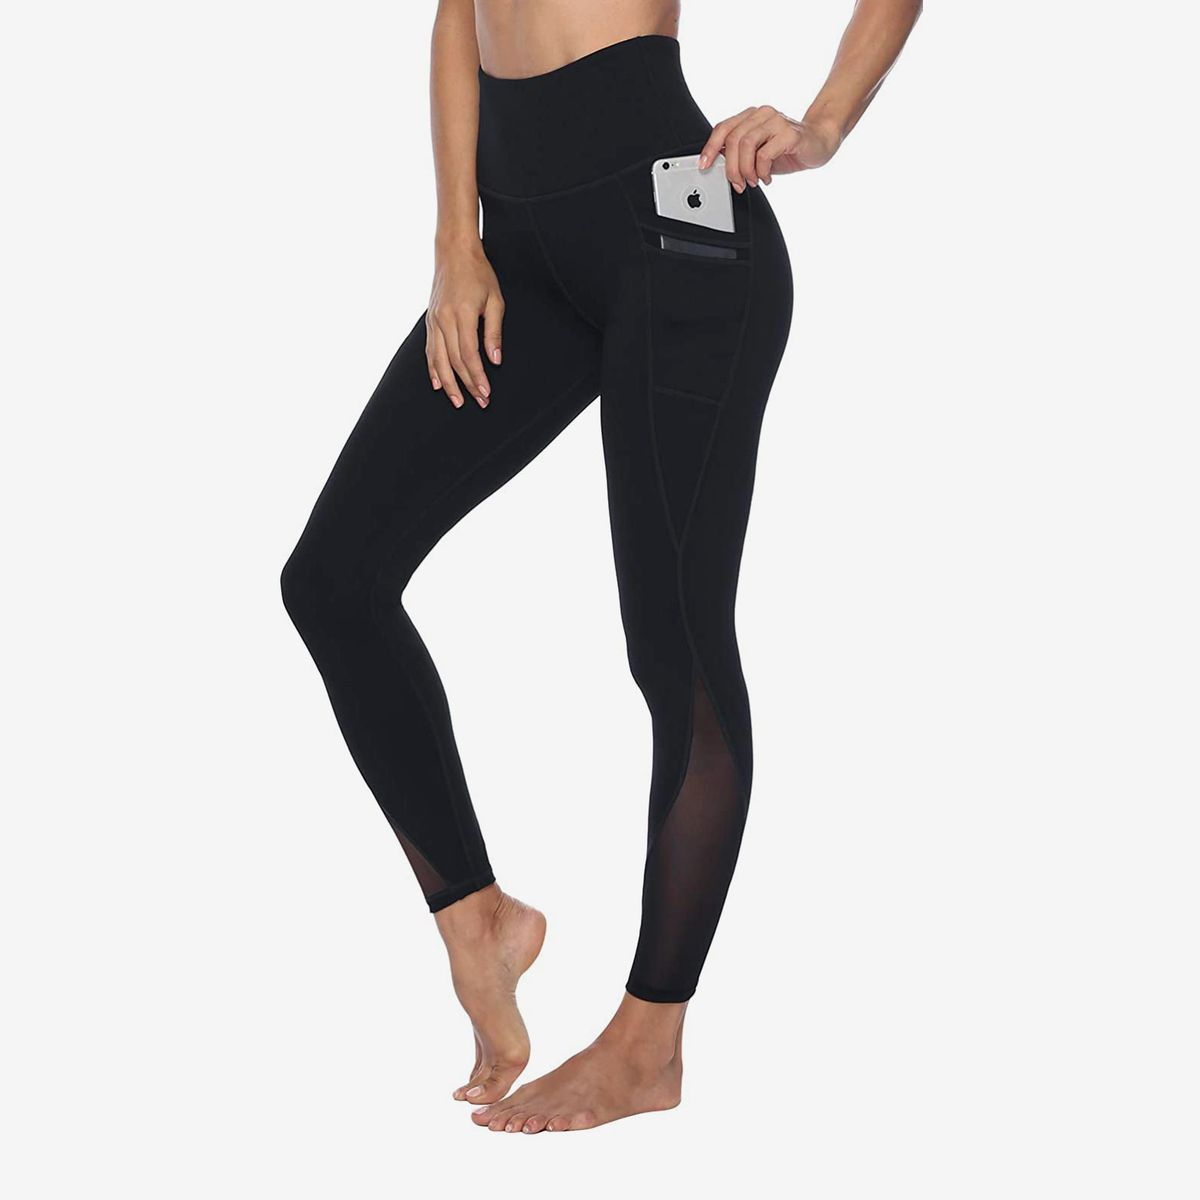 Gift Outside Pocket Women Cardio Yoga workout Compression Capris Pants